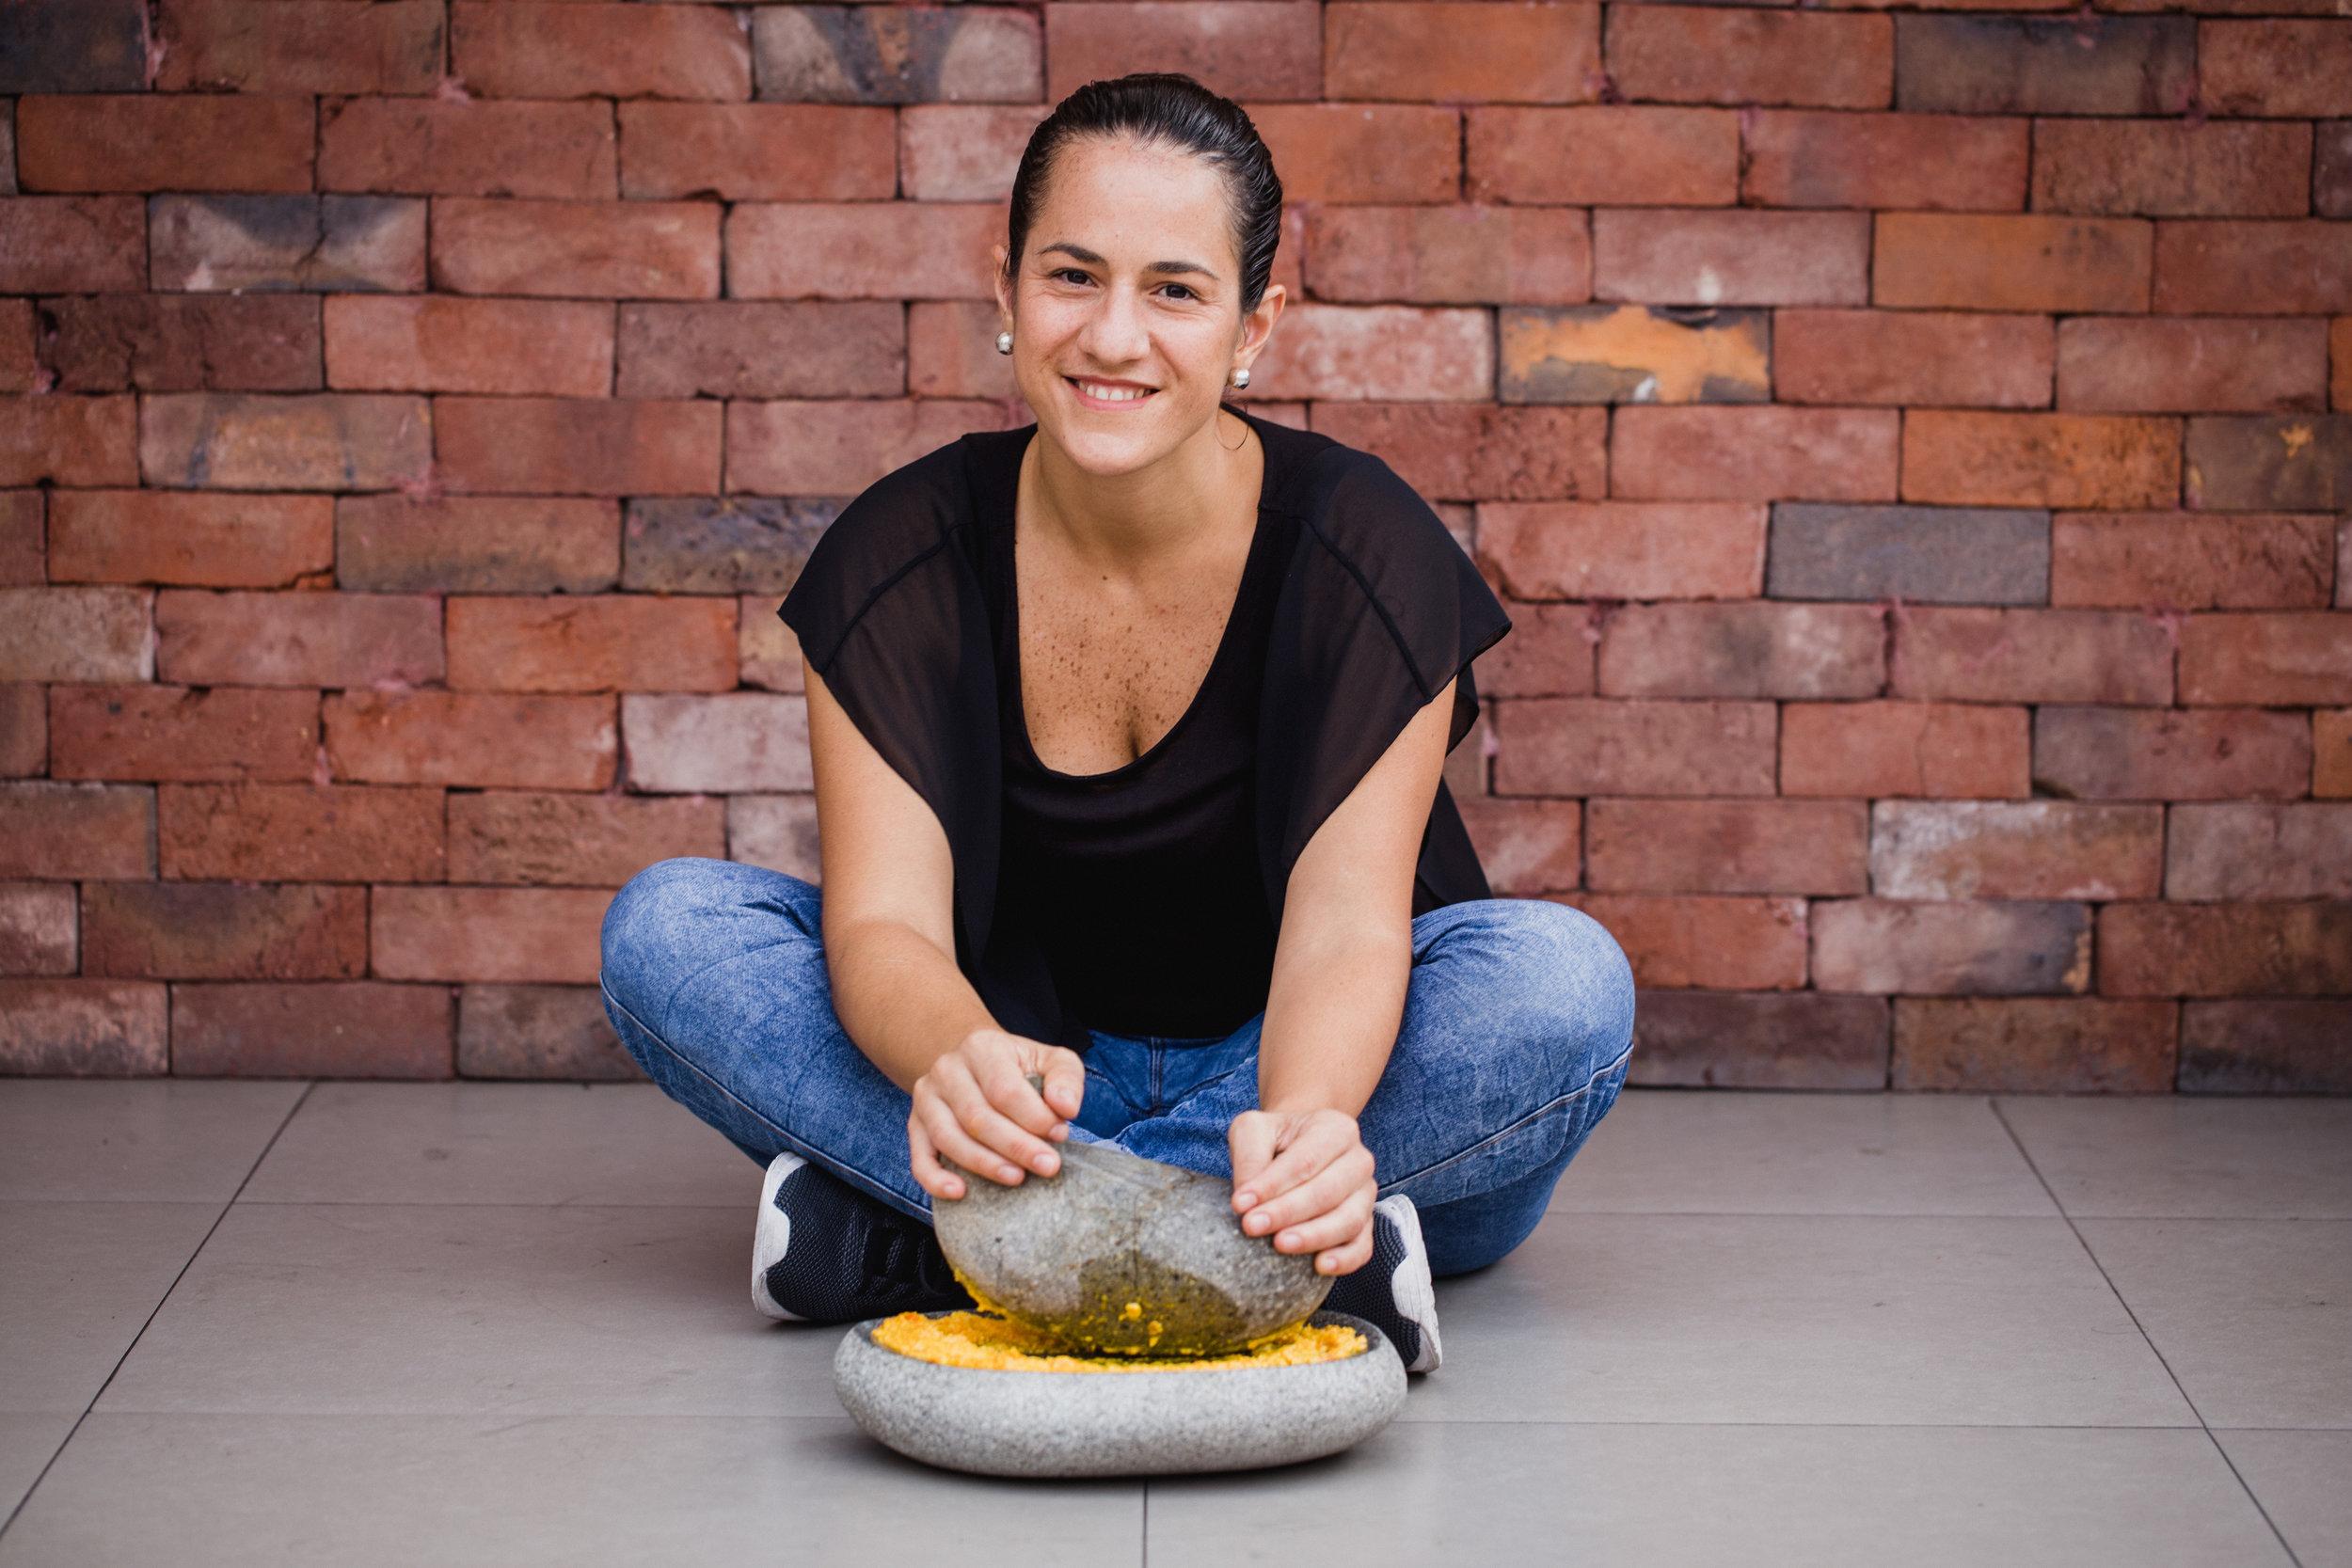 AIMA   Hora de tapear a la peruana: tostadas y tapas a base de yuca, papa rellena o papa frita, con harto sabor criollo y acompañadas de salsas preparadas en un tradicional batán de piedra.